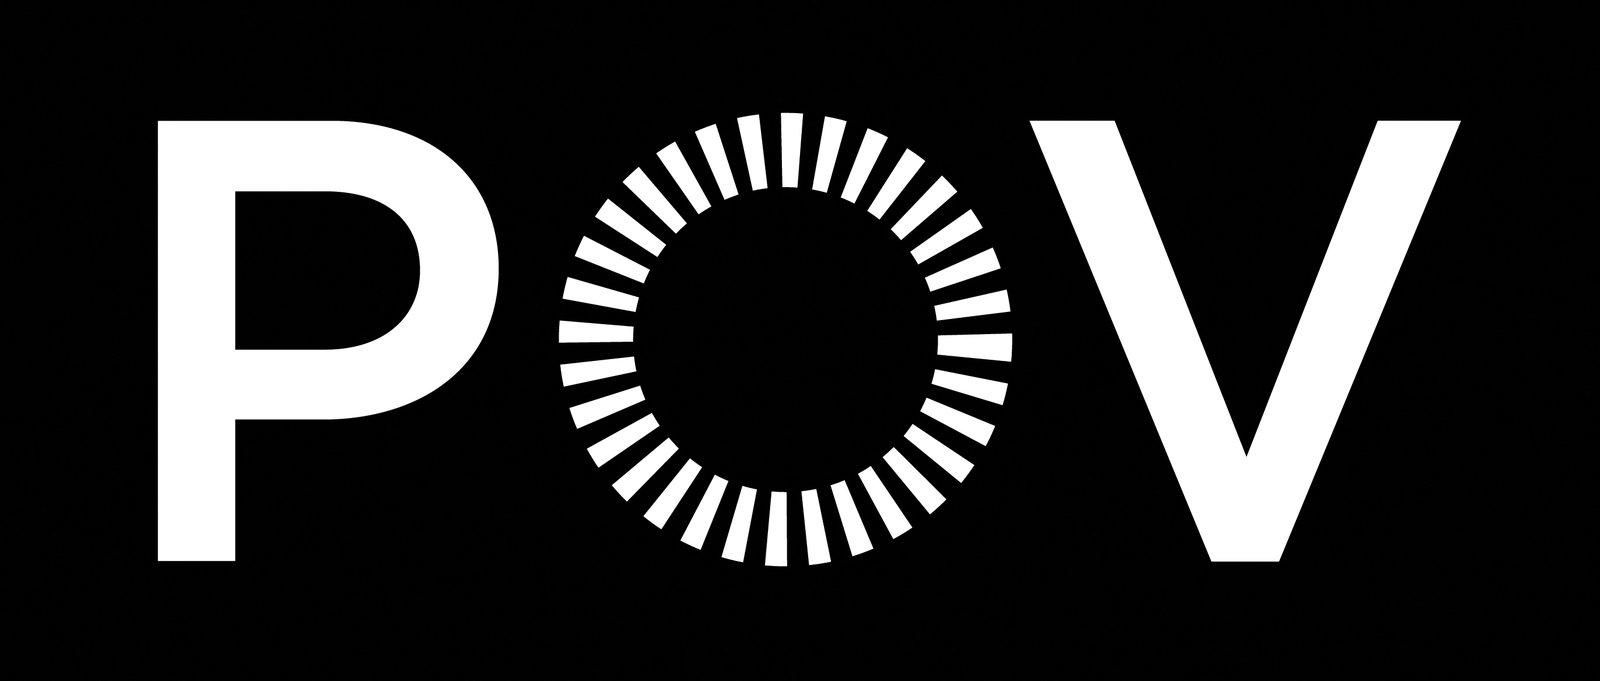 amdoc-pov-series-logo.jpg